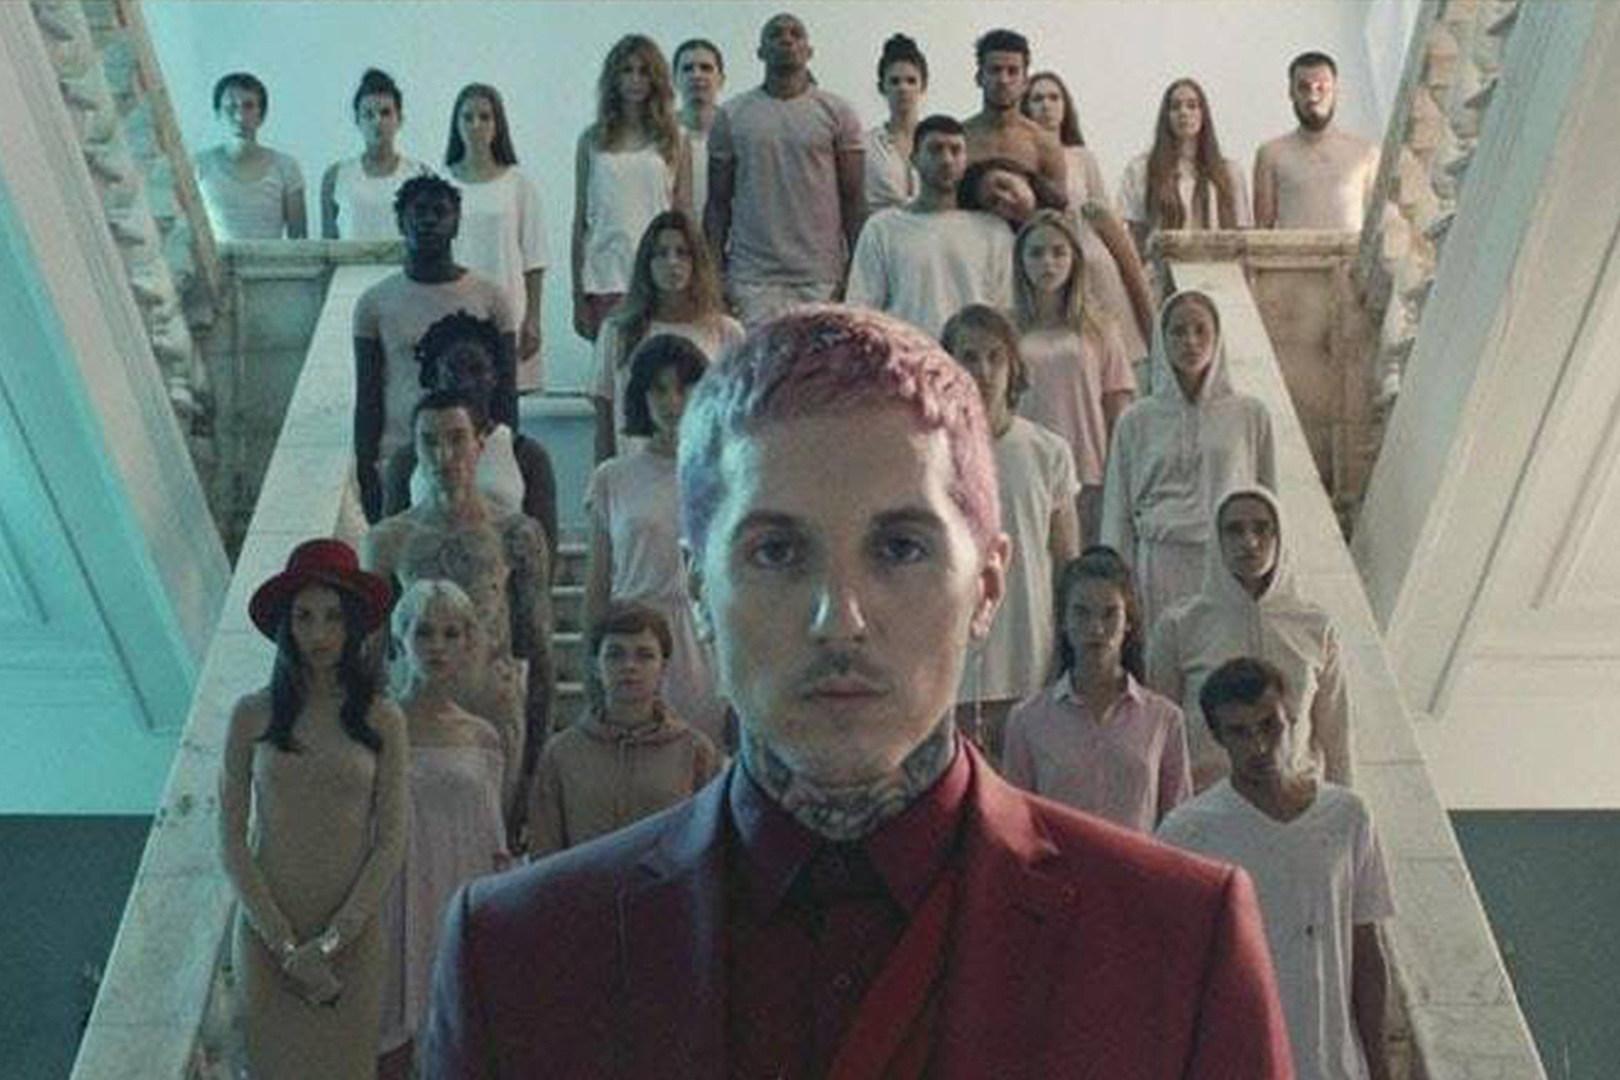 Is This Bring Me the Horizon's New Album Artwork?